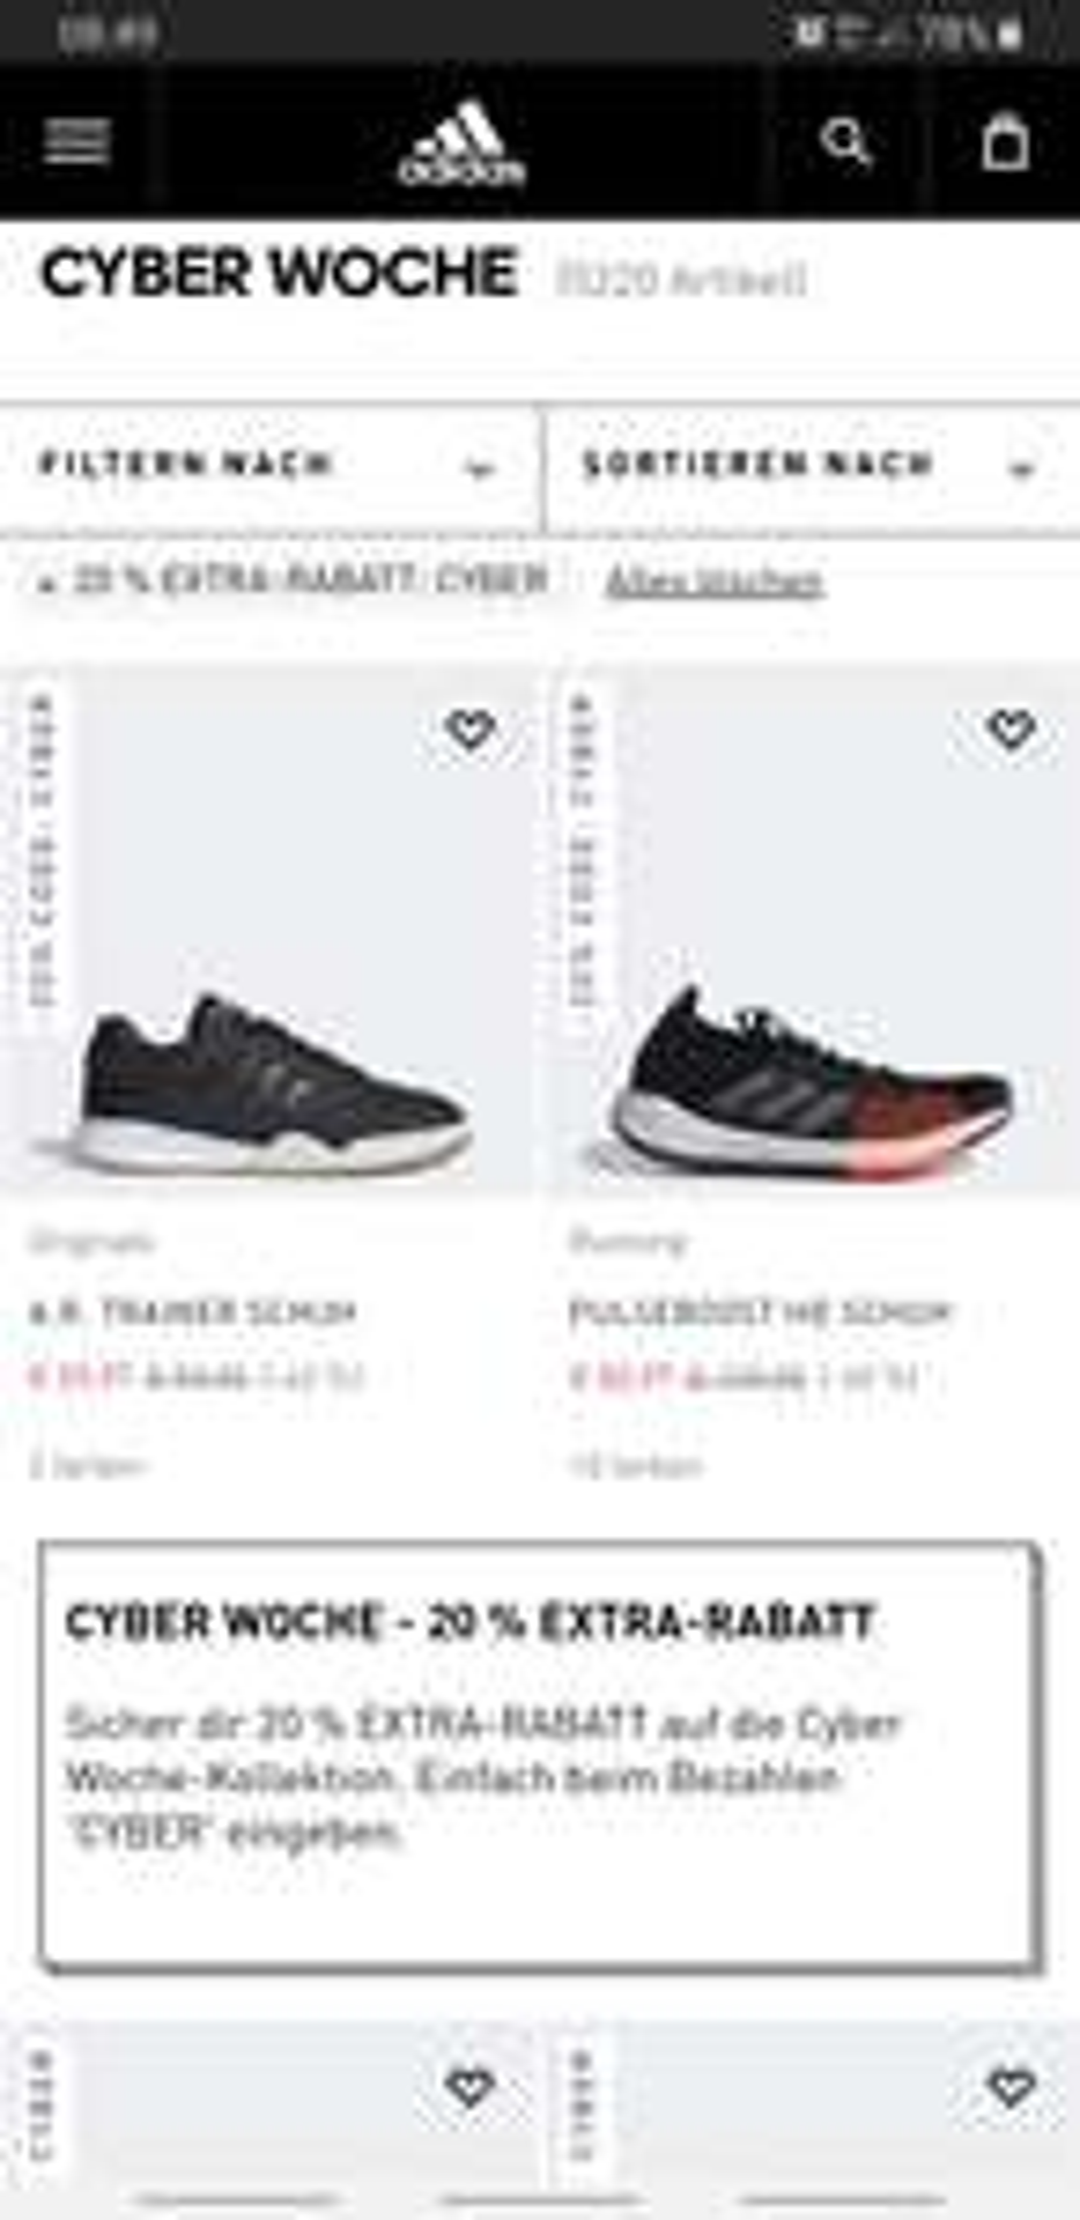 adidas Online Shop Angebote & Deals ⇒ Oktober 2020 Preisjäger